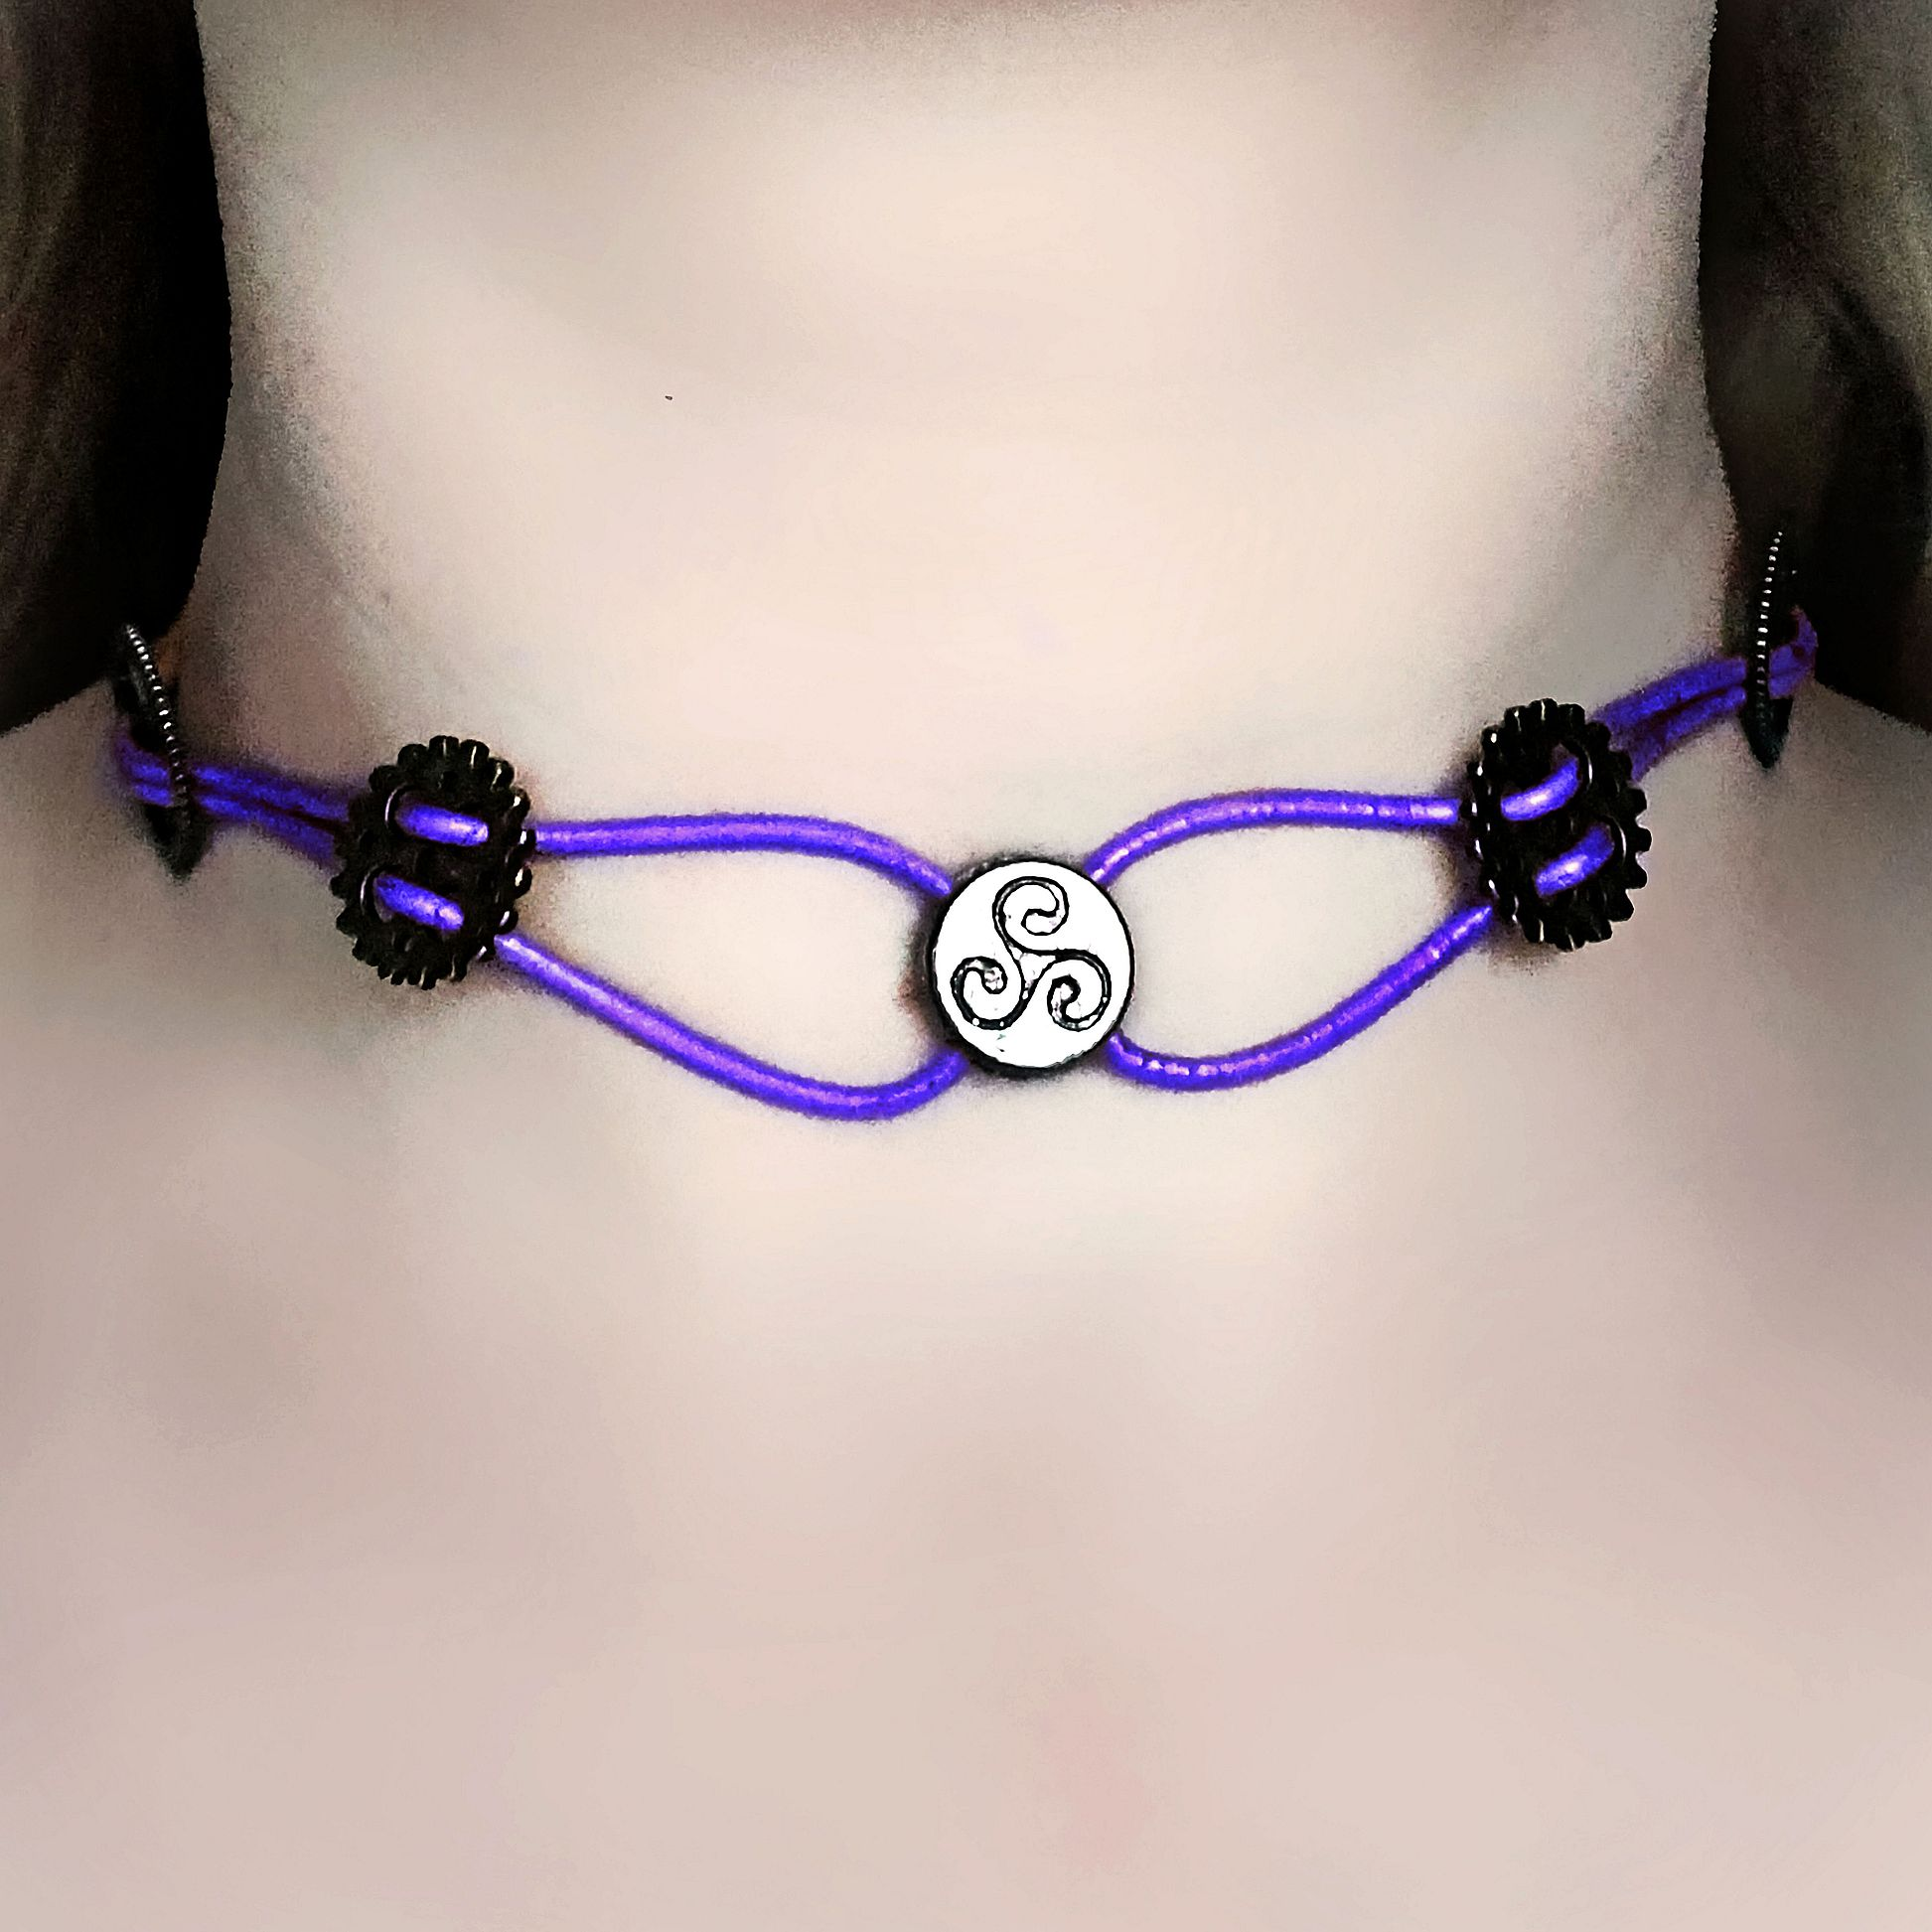 Submissive triskele collar choker steampunk bdsm symbol triskelion product details biocorpaavc Gallery